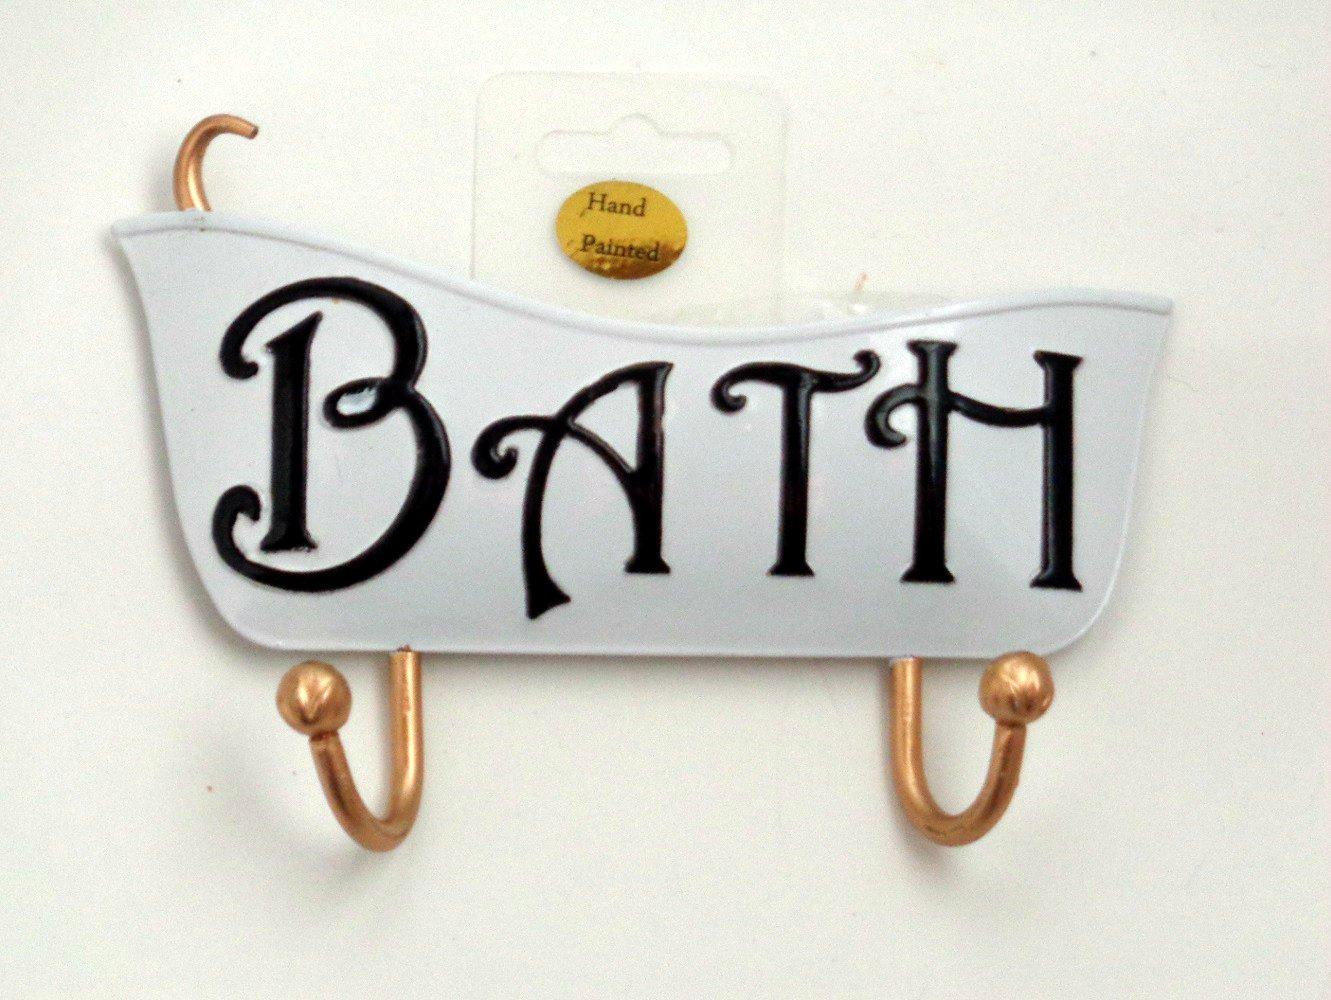 Bath Tub Sign with Wall Hooks